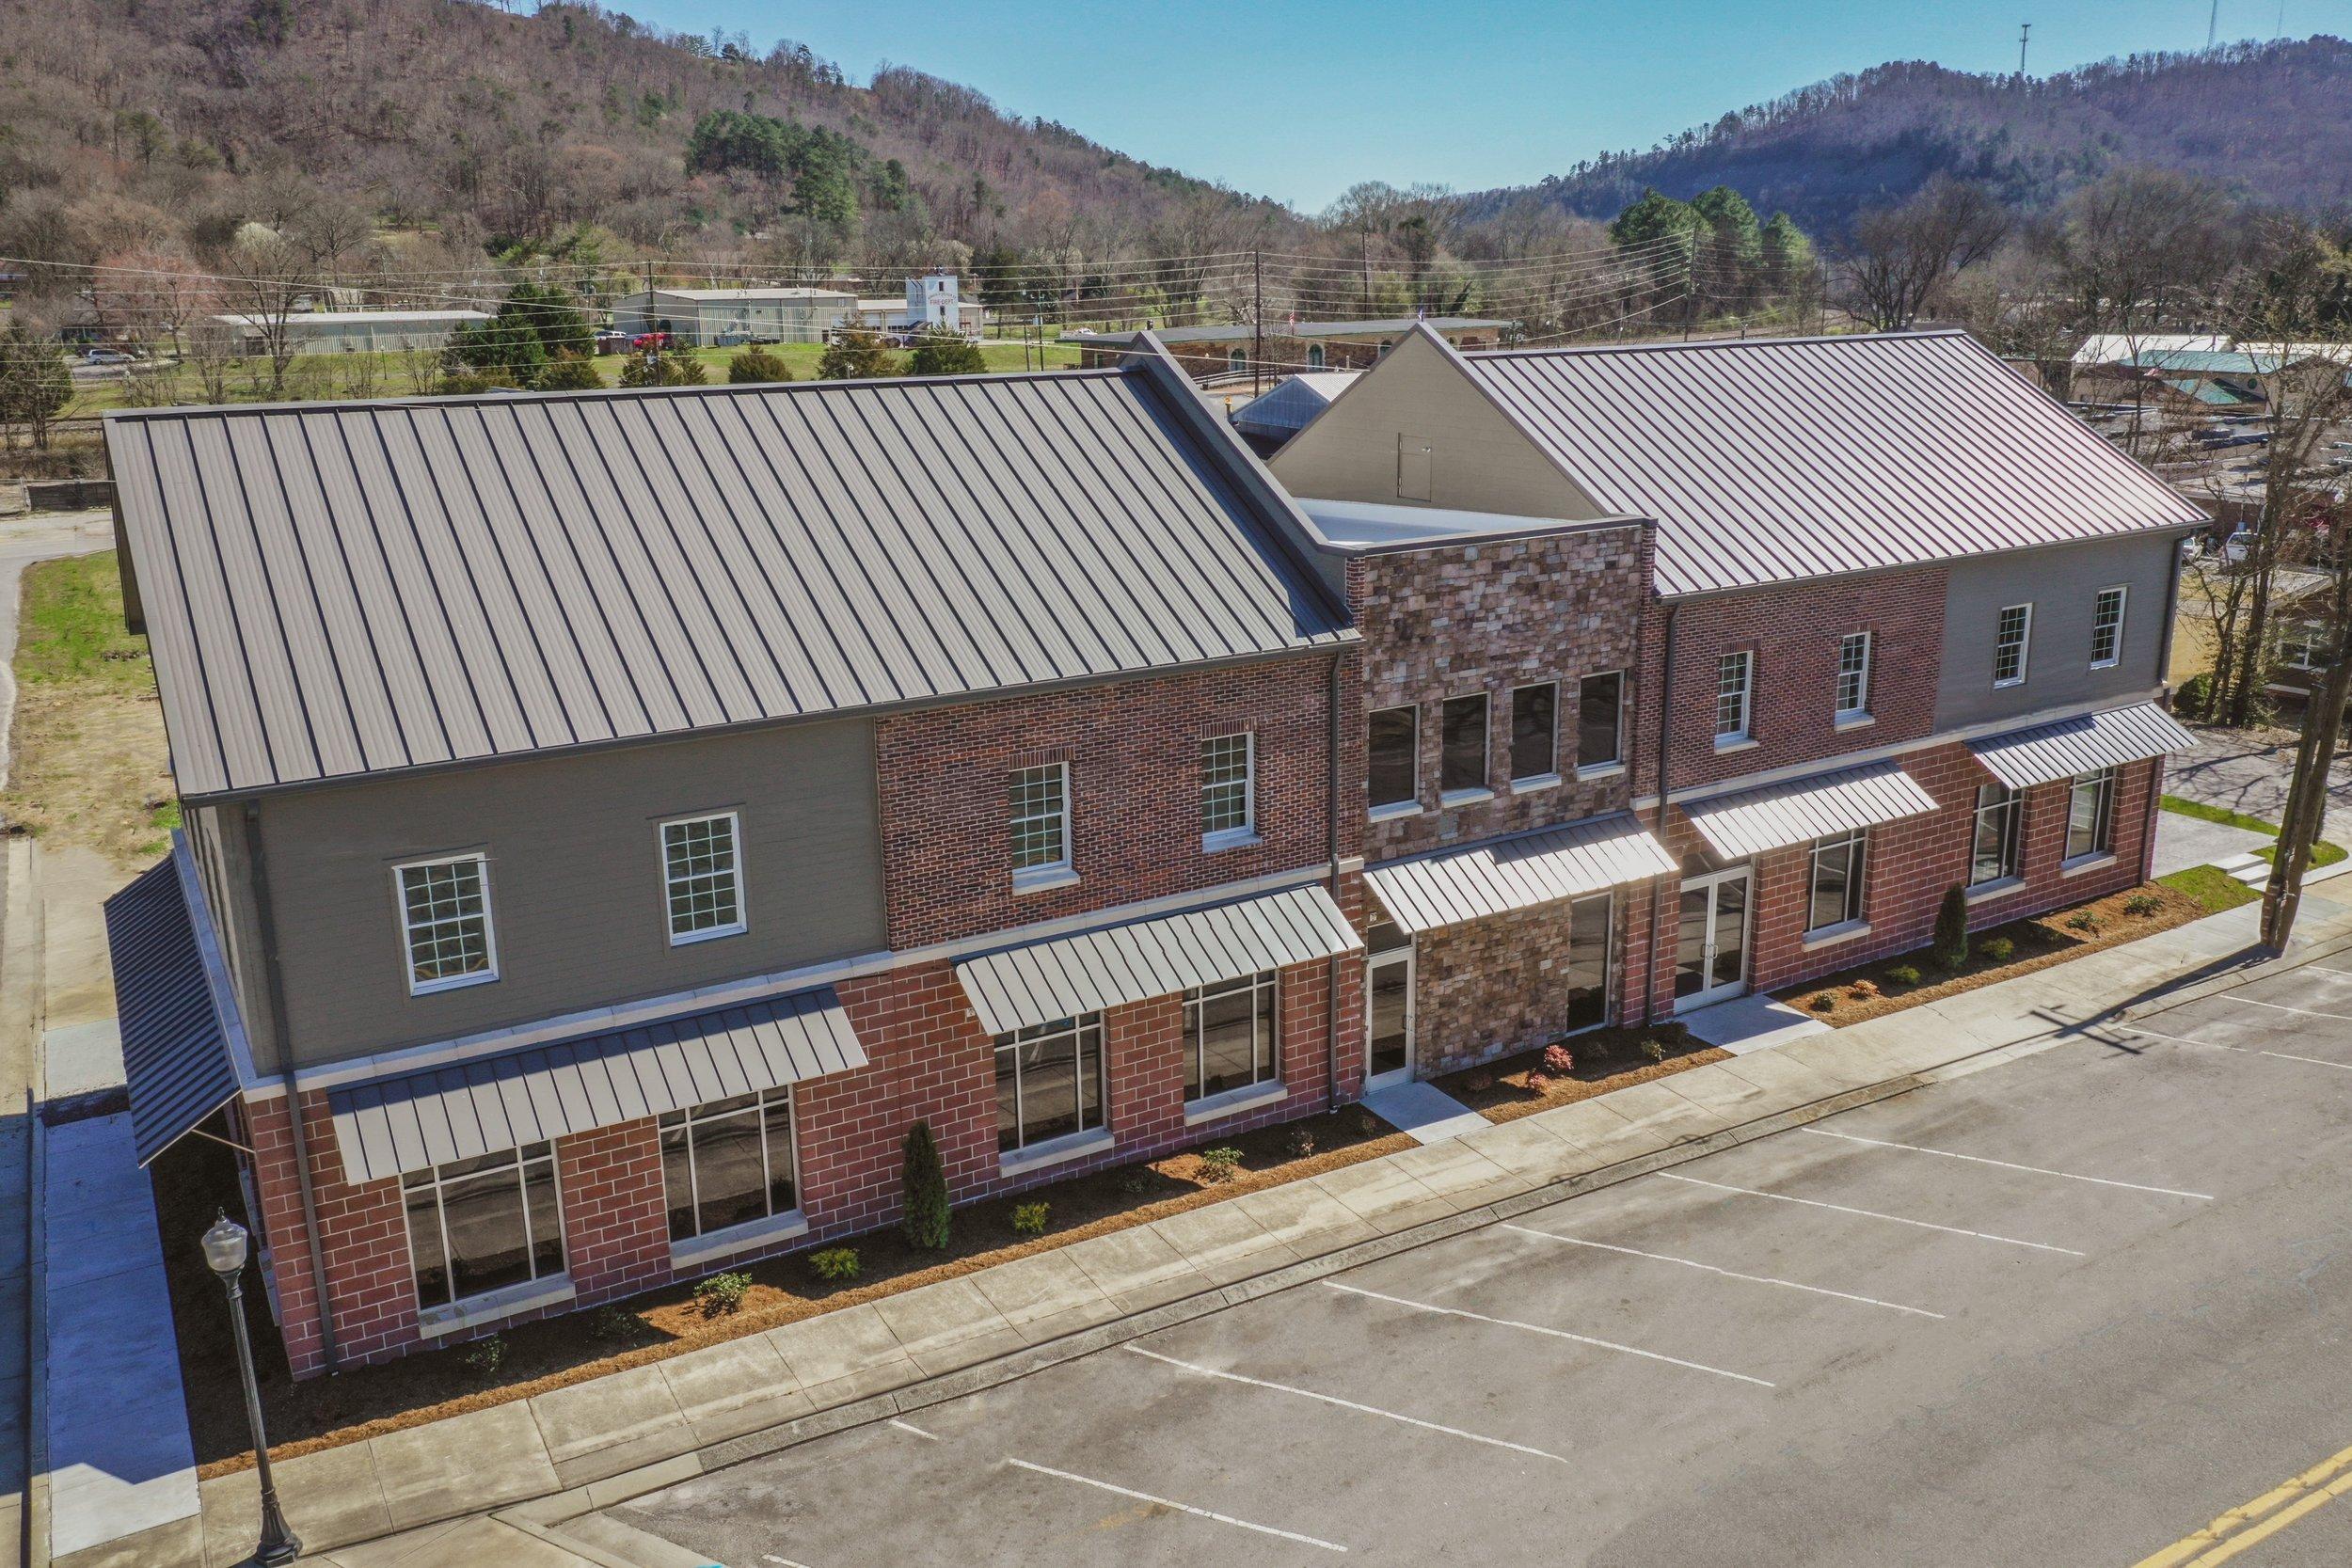 Tennessee Street DevelopmentRinggold, Georgia - RINGGOLD TELEPHONE PROJECT